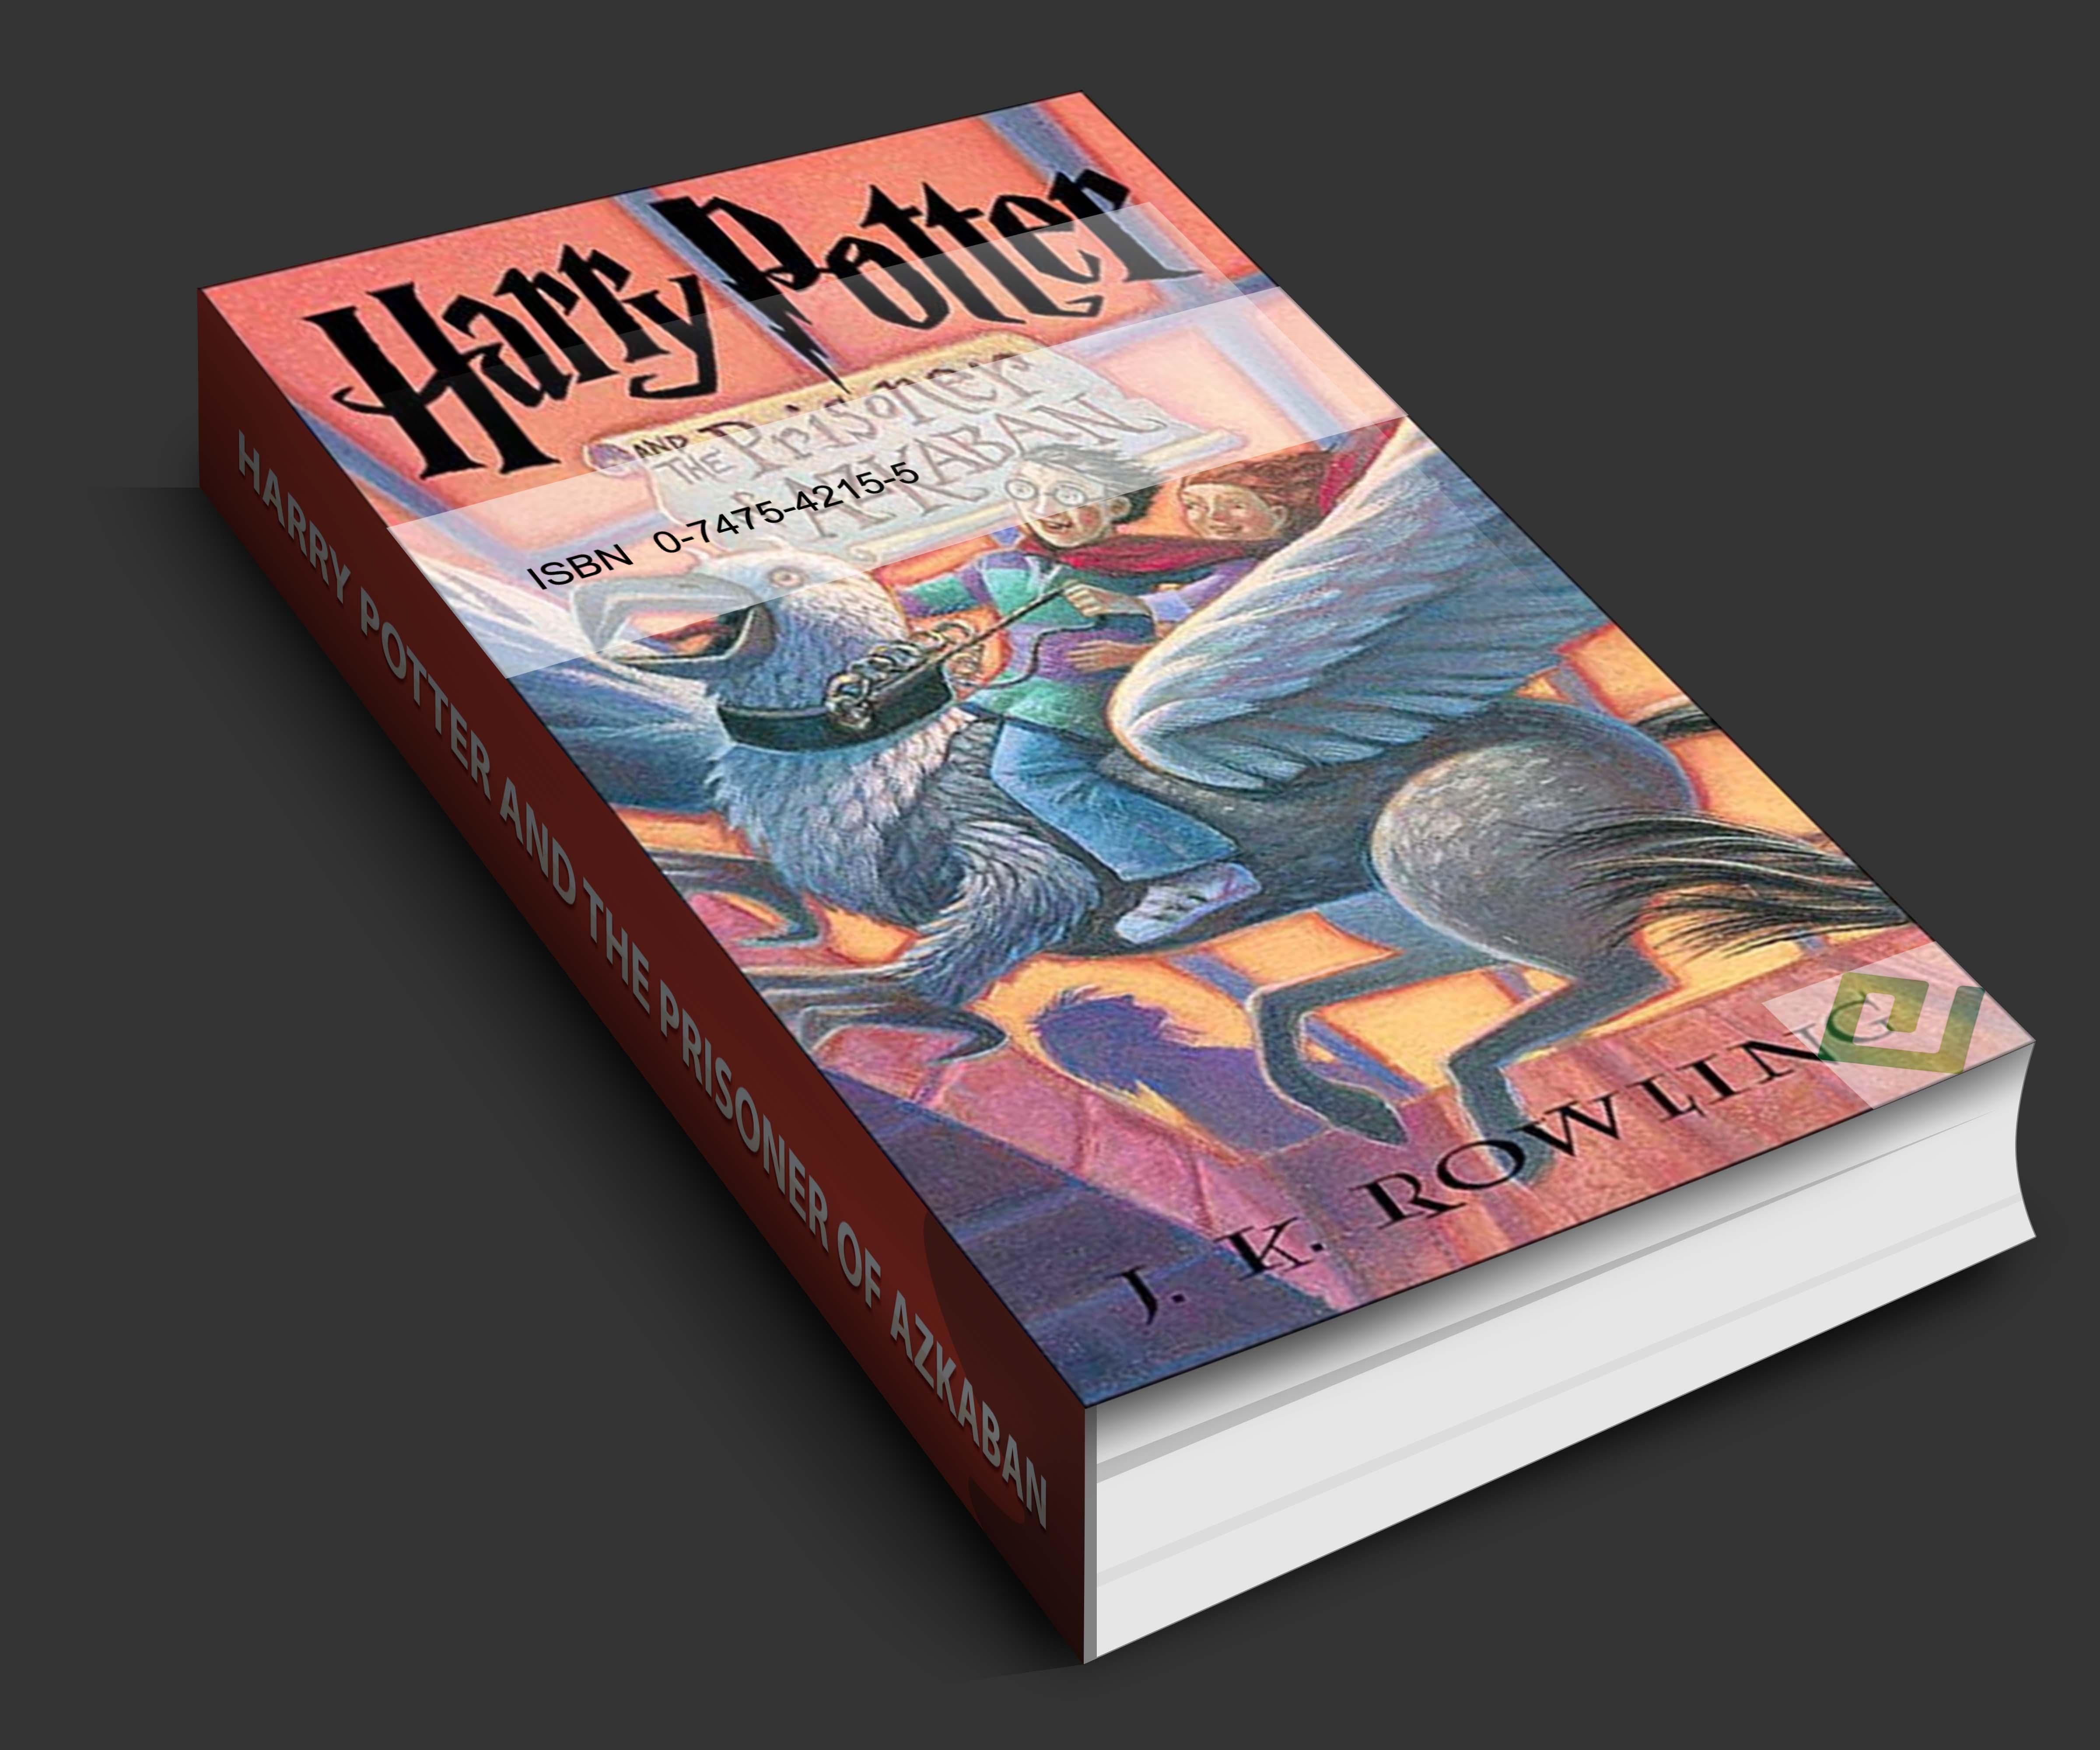 harry potter prisoner of azkaban free pdf